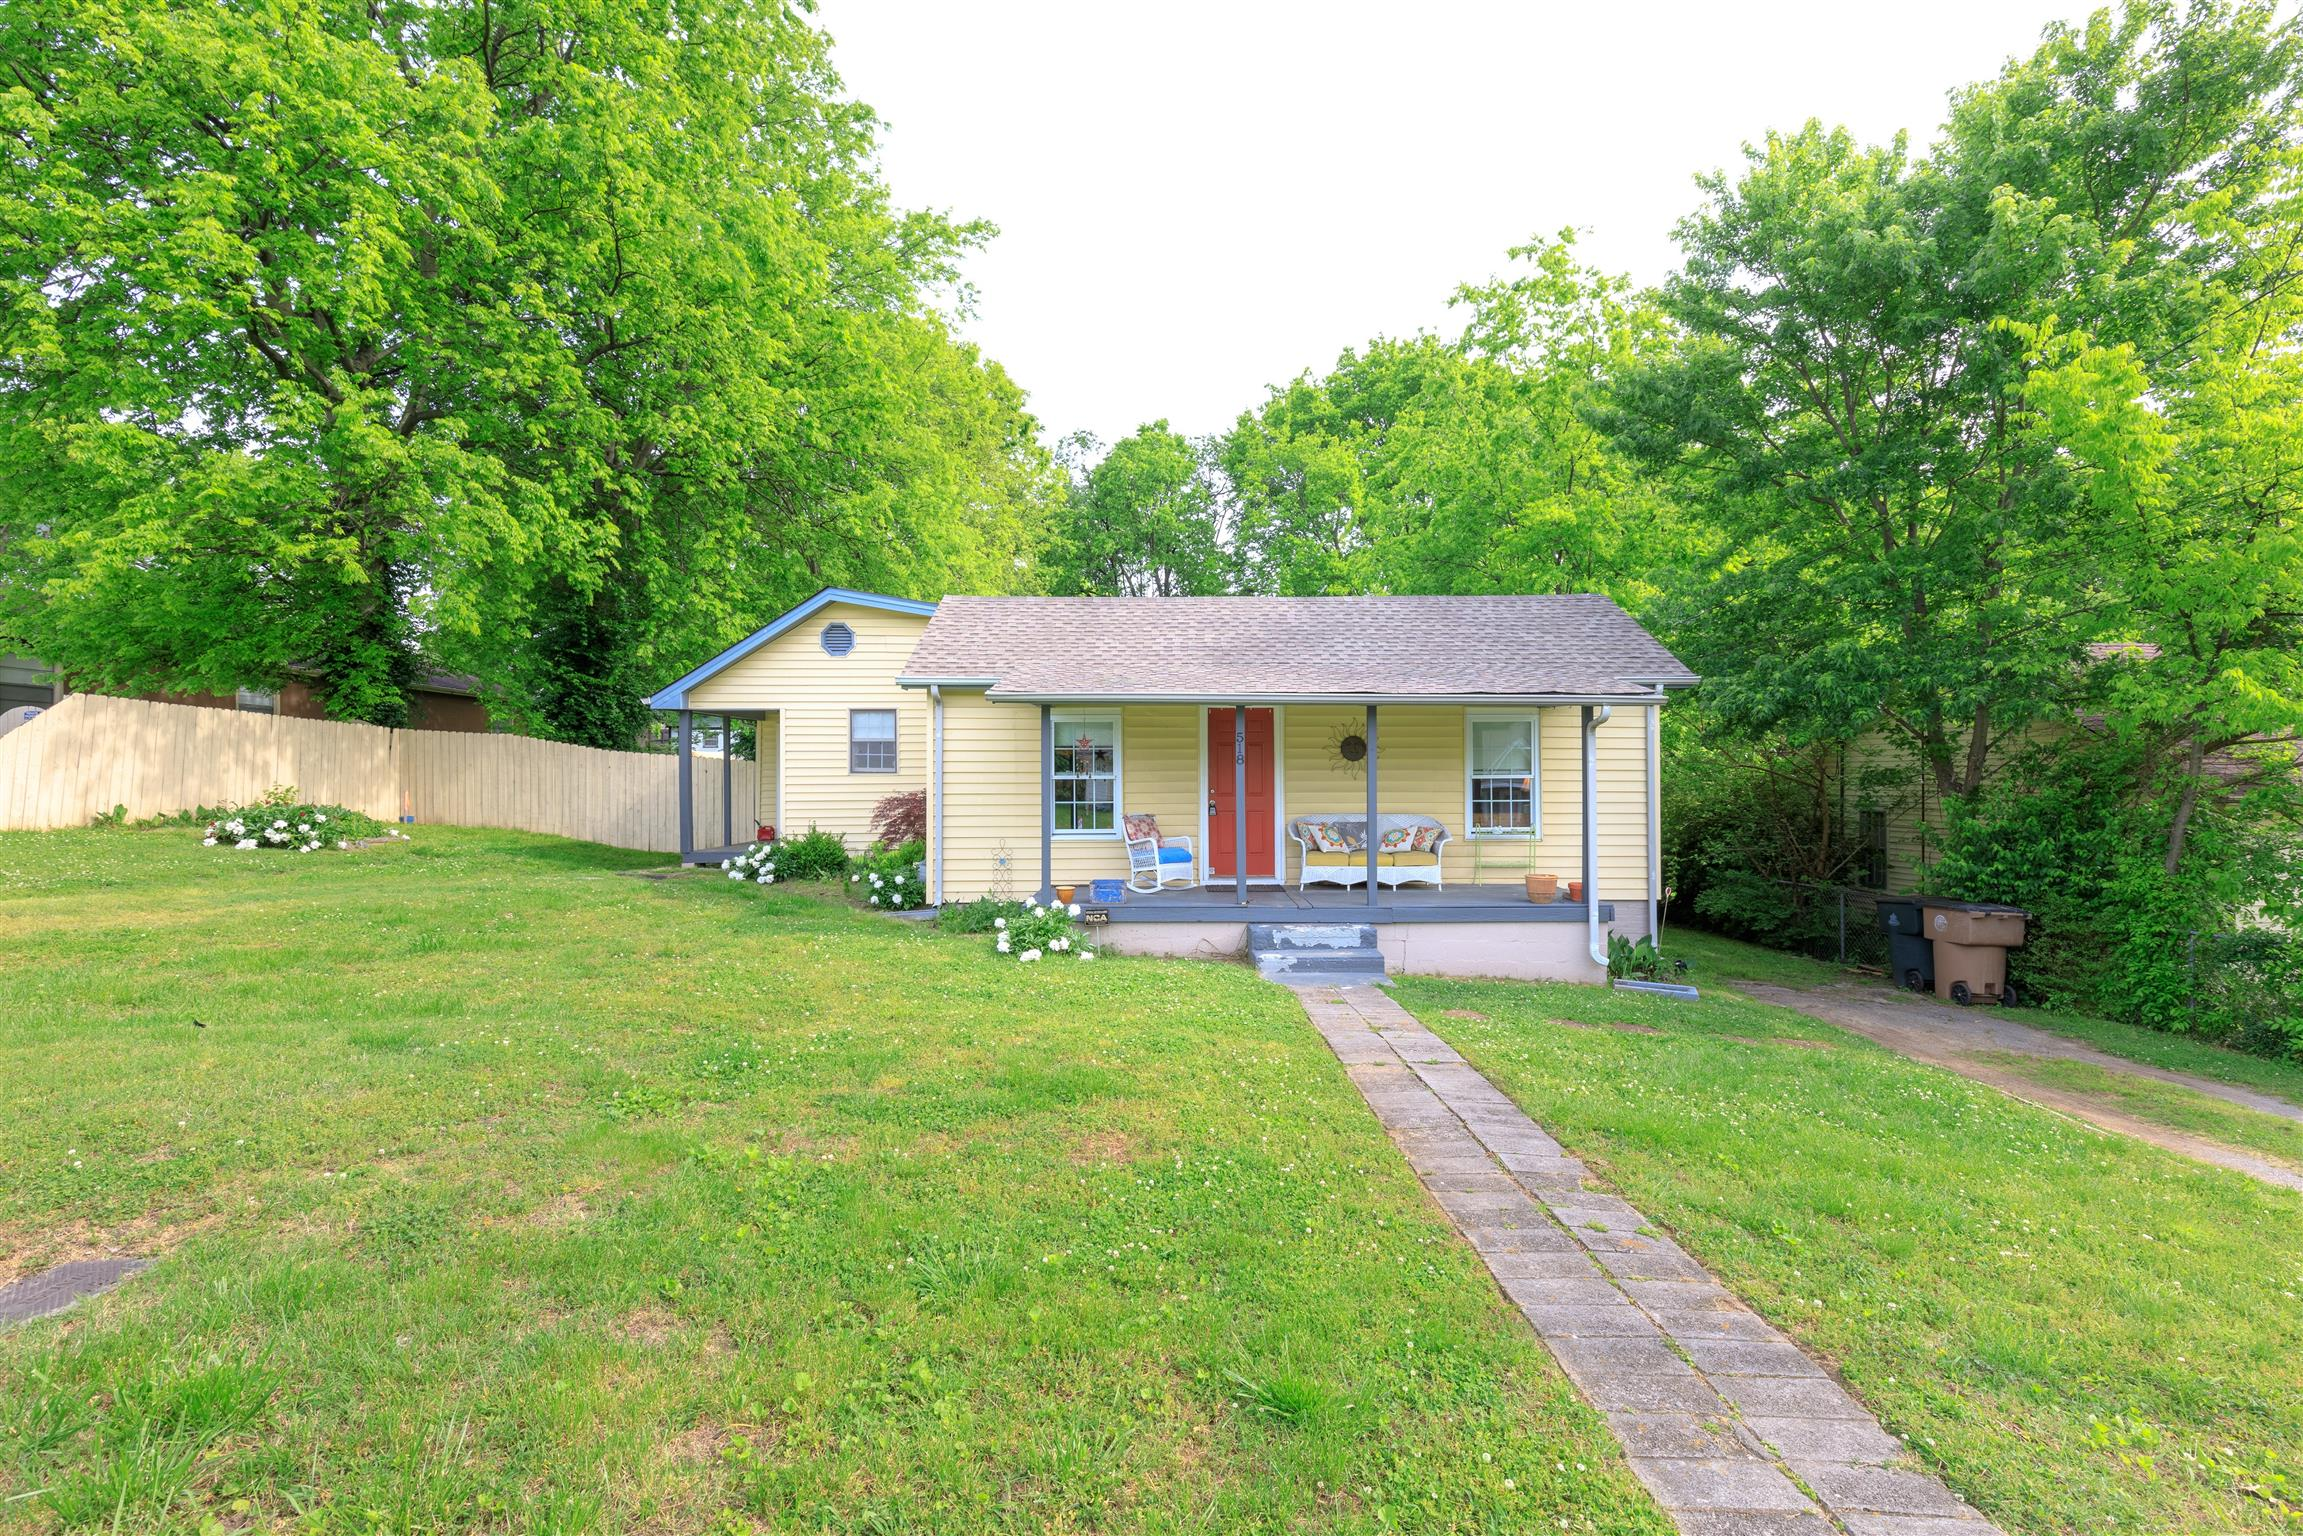 518 Raymond St, Nashville, TN 37211 - Nashville, TN real estate listing